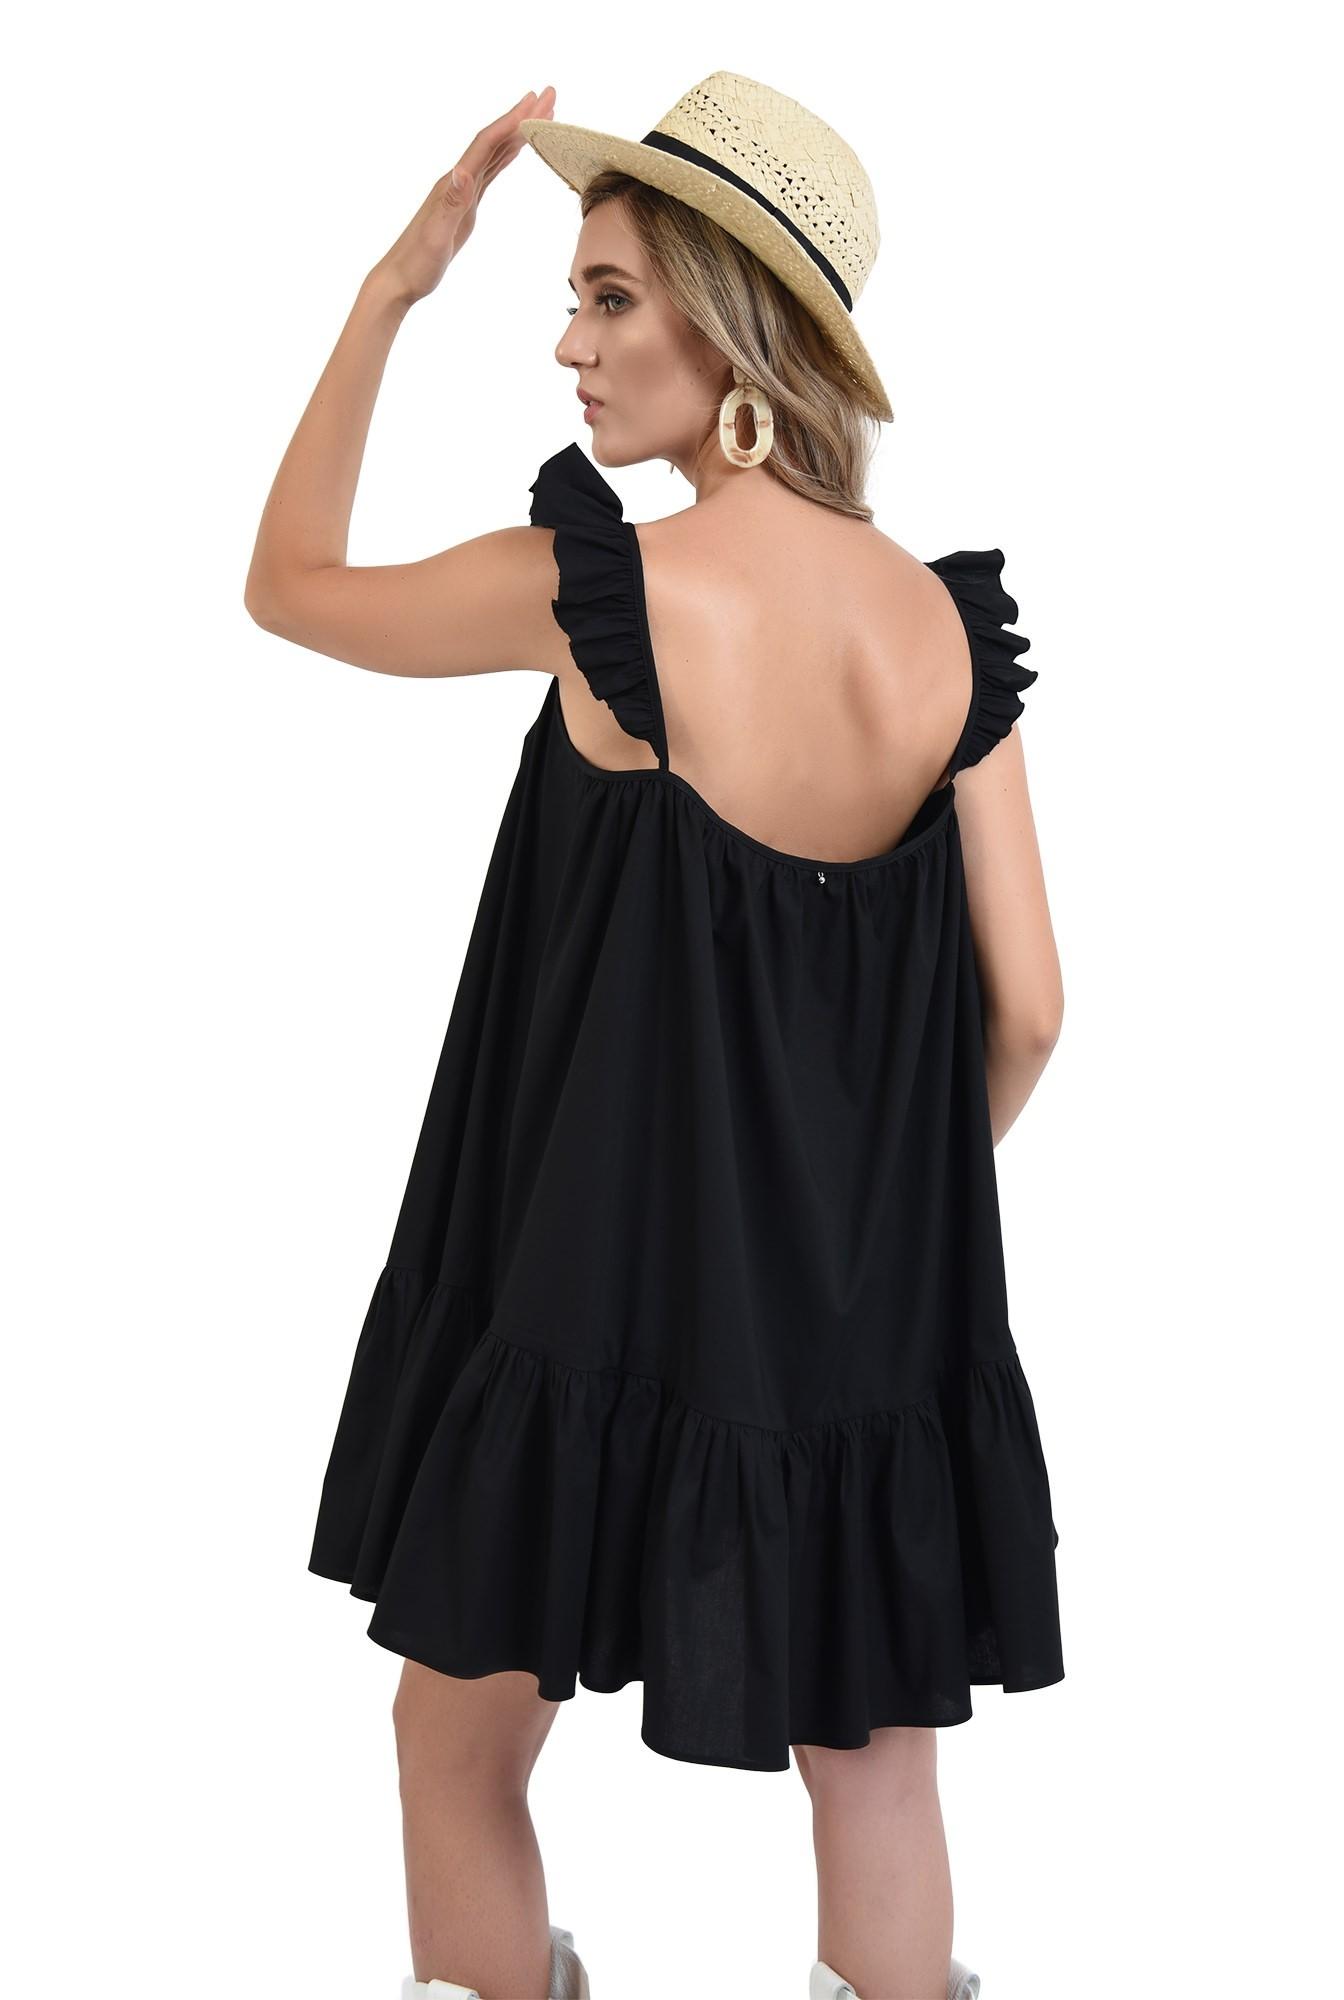 rochie neagra, mini, evazata, cu volan la baza, cu bretele, bumbac